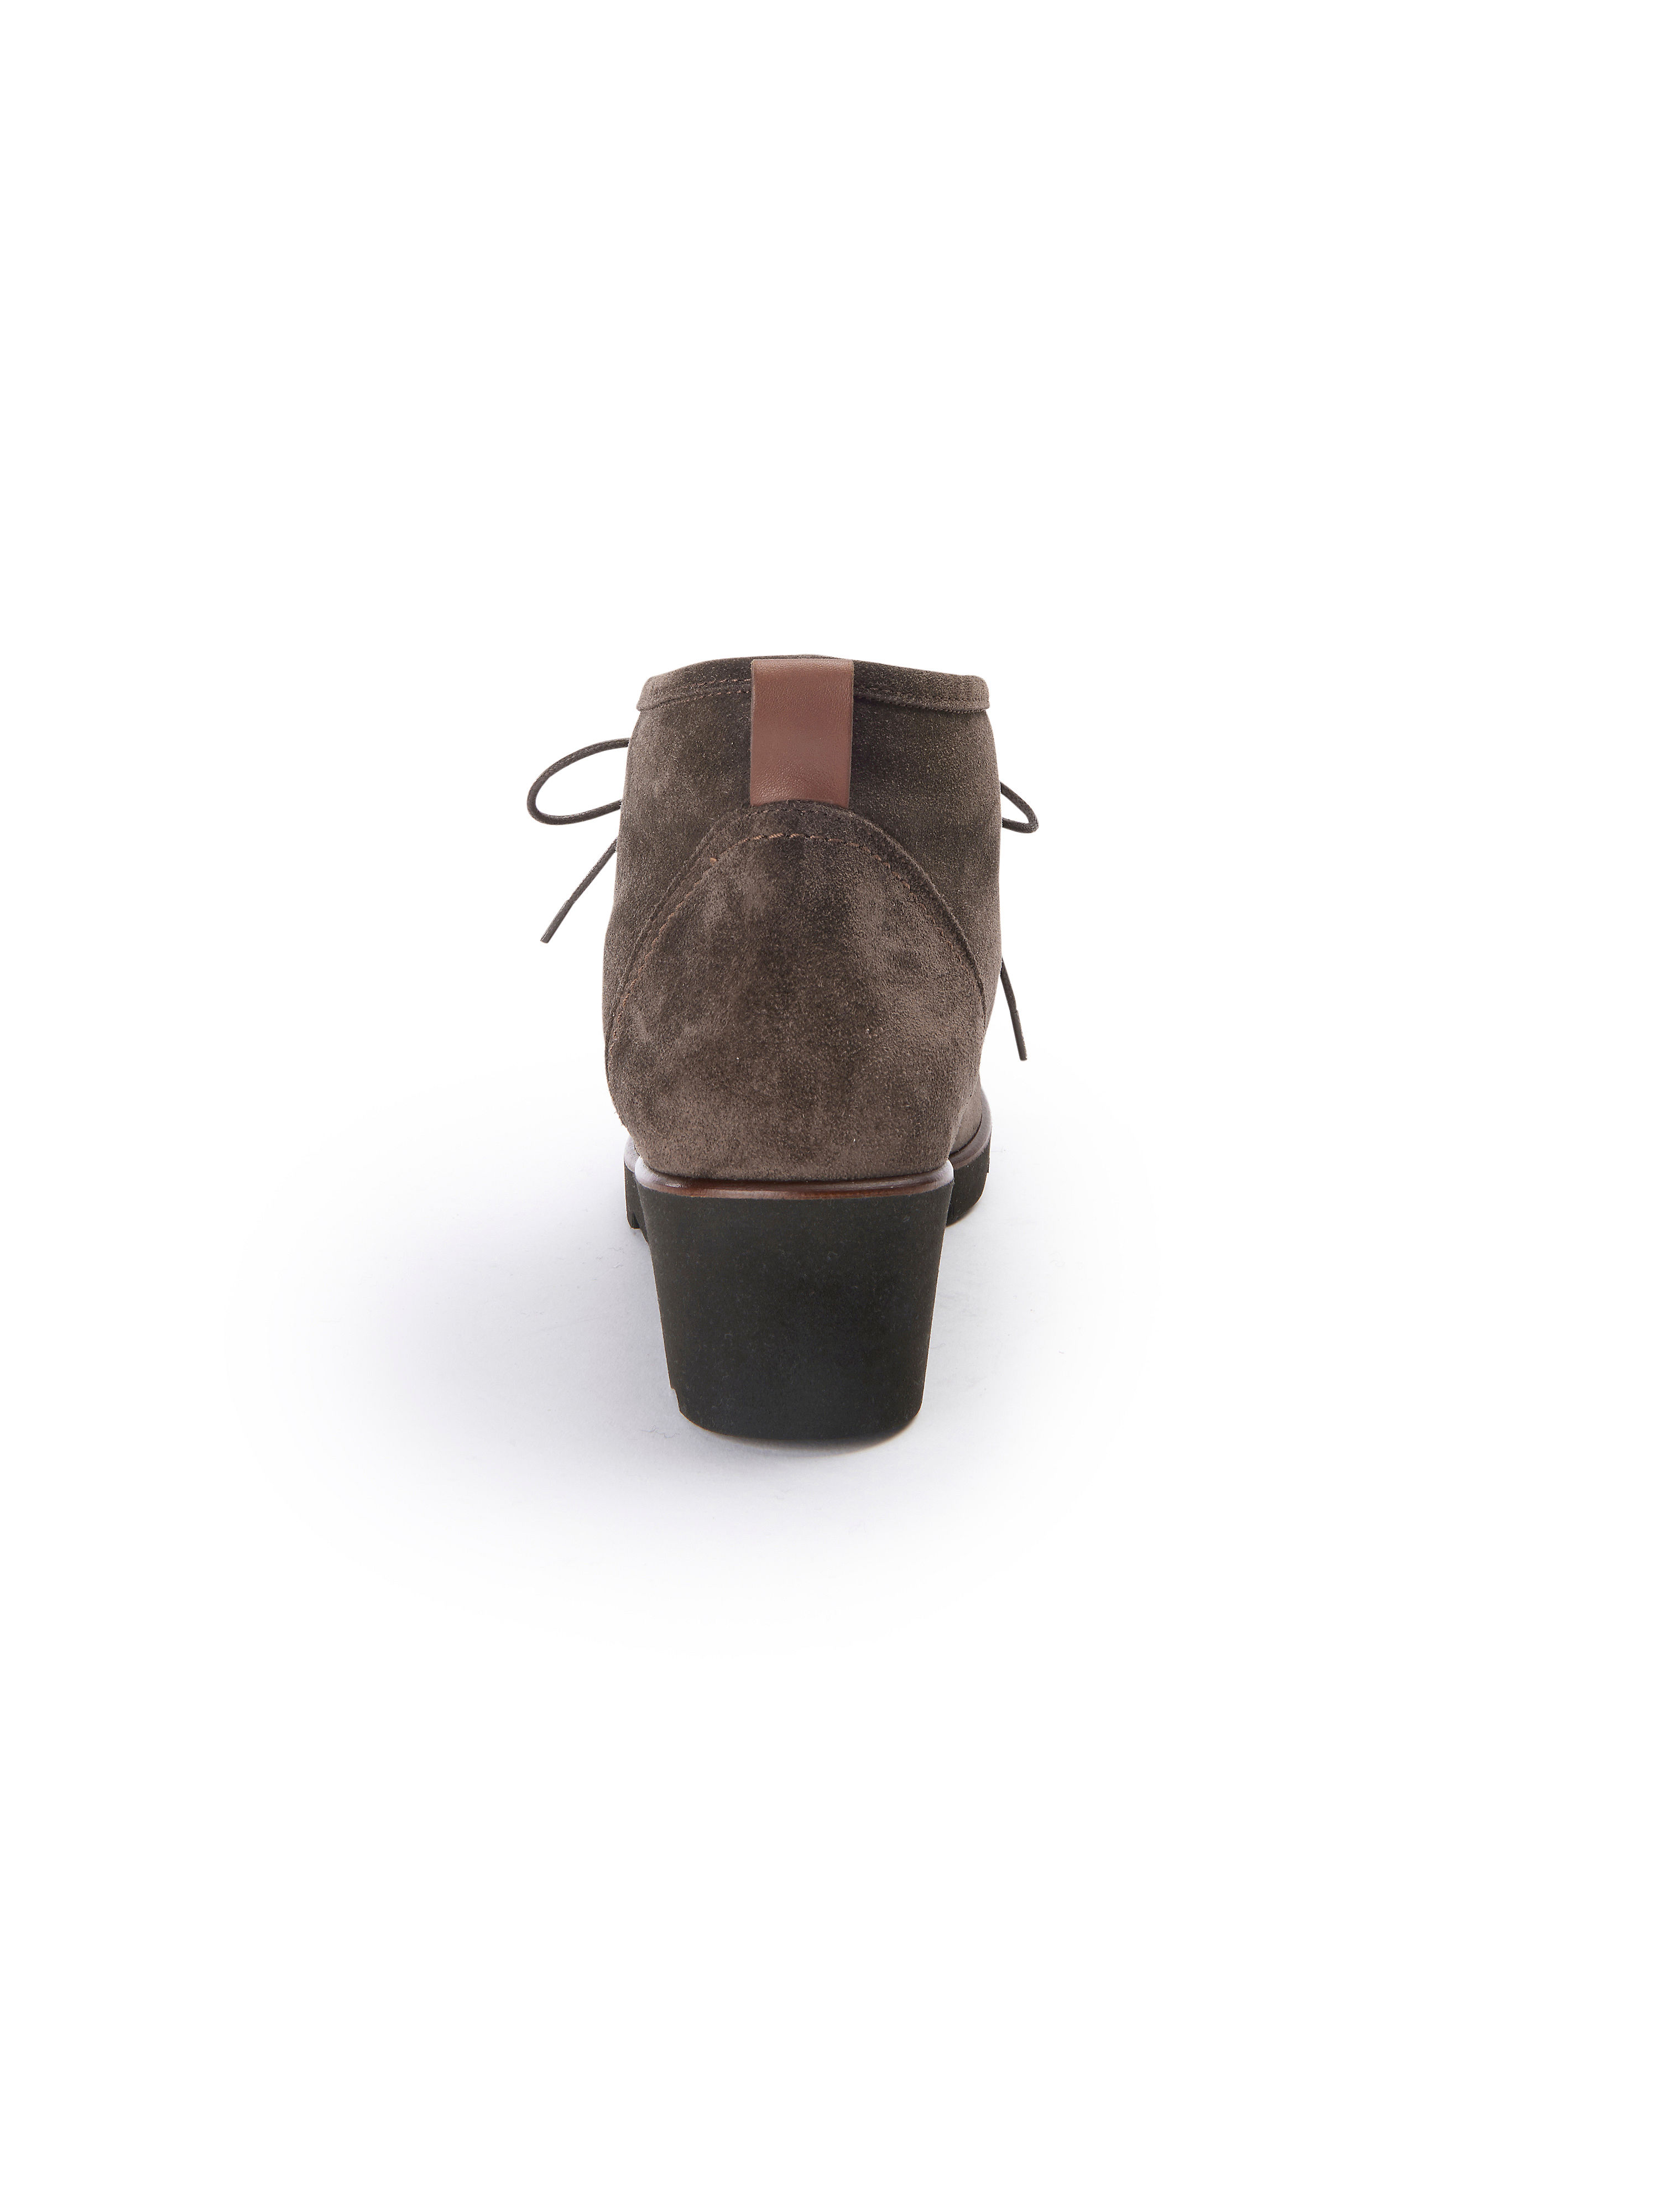 Peter Hahn exquisit - Gute Knöchelhoher Schnürer - Dunkelbraun Gute - Qualität beliebte Schuhe 957be3